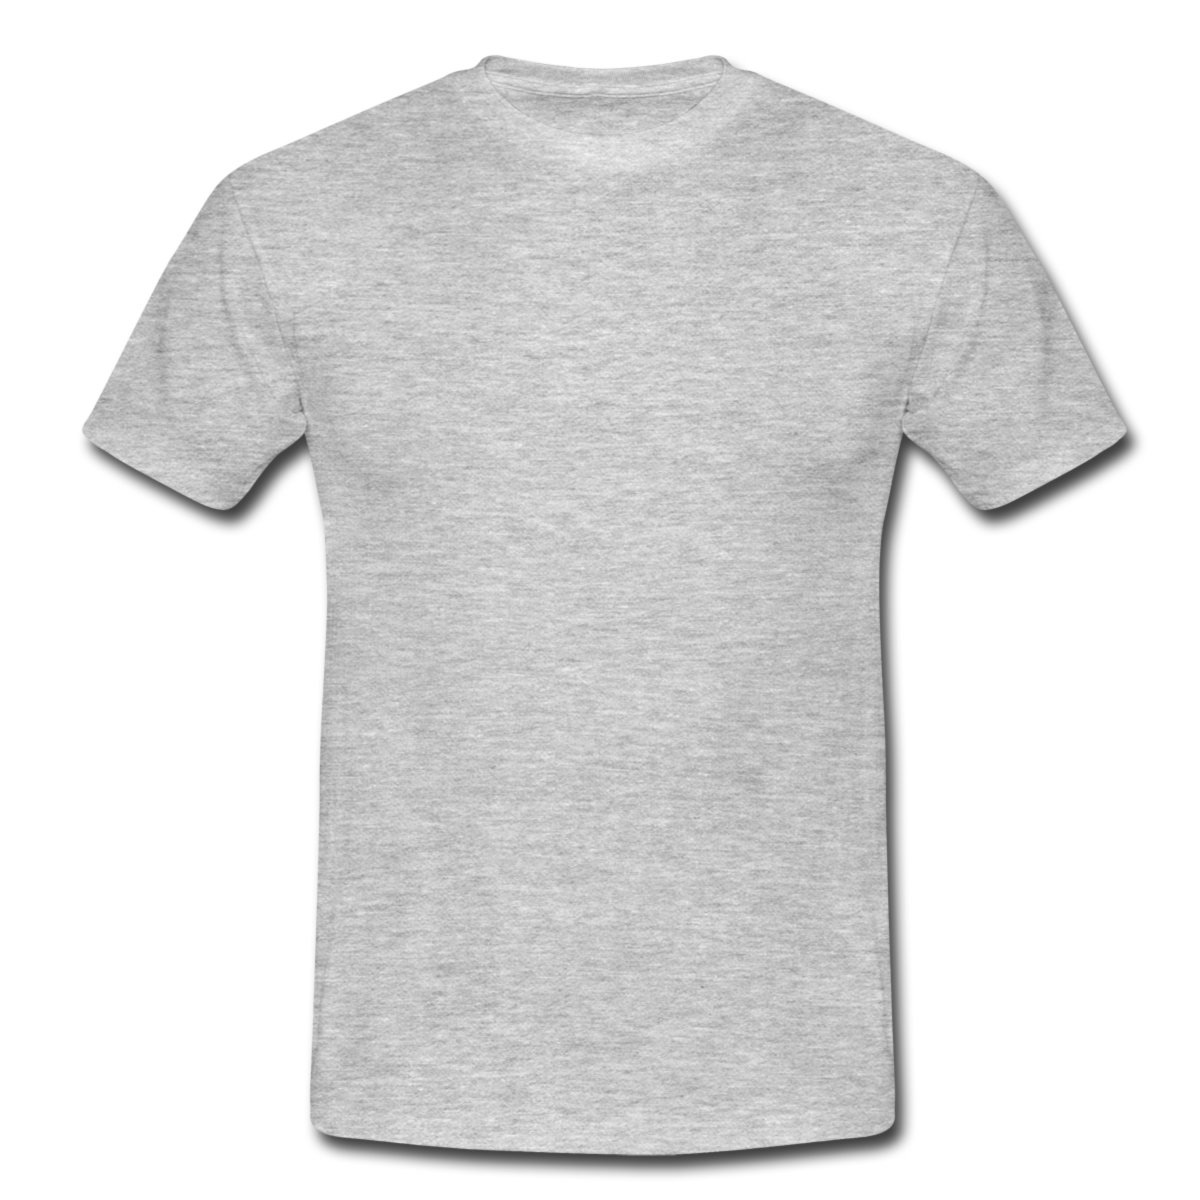 detailing c5078 e8c2b T Shirt Druck Selbst Gestalten Günstig | RLDM